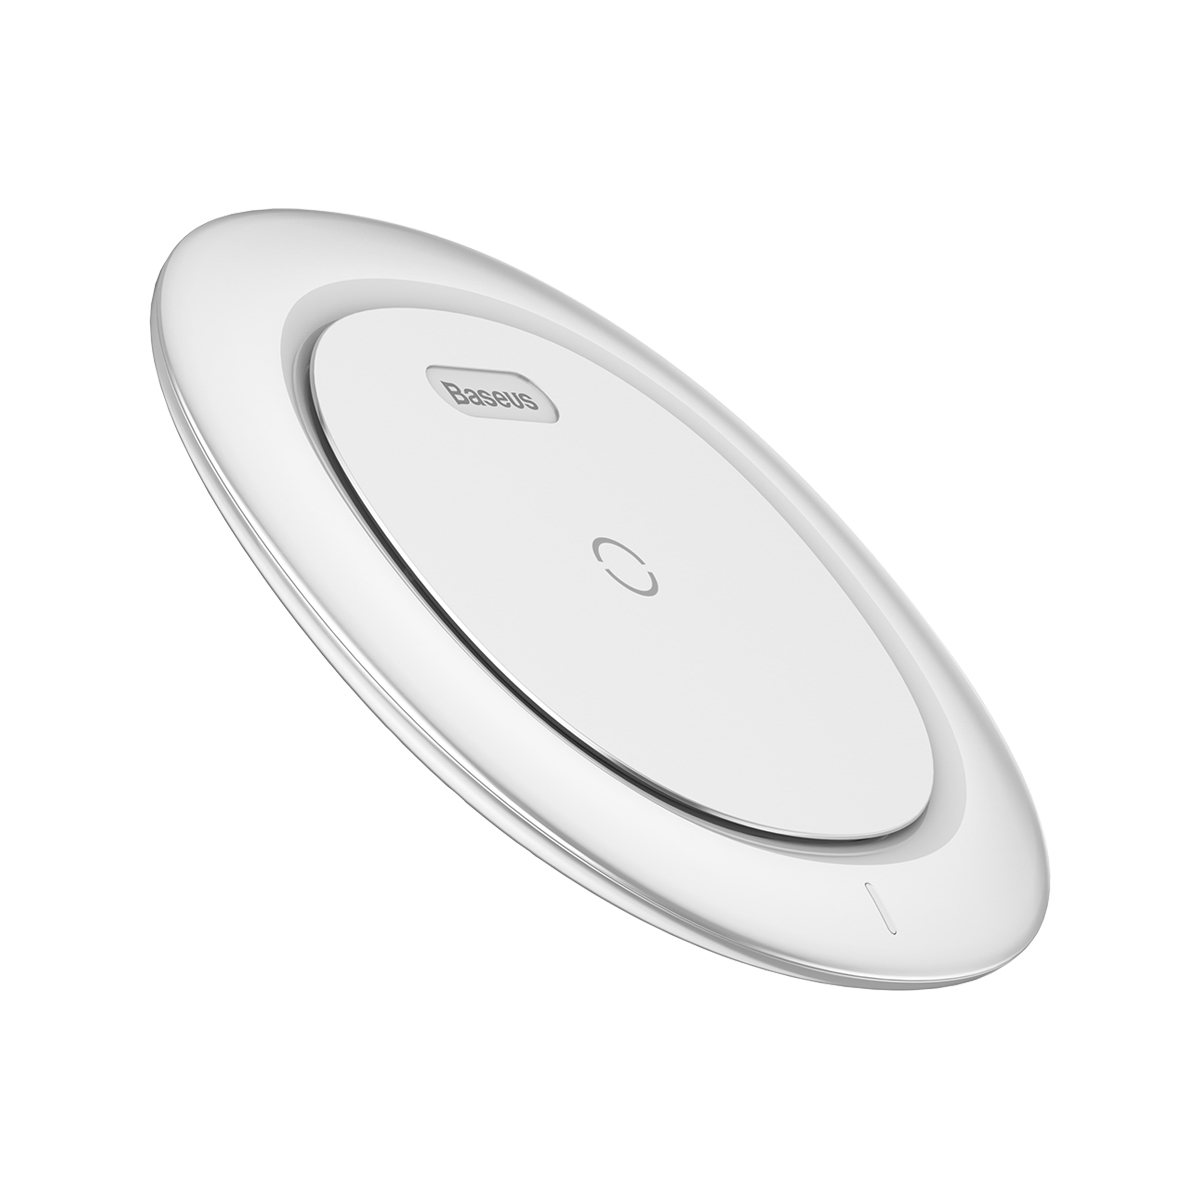 Беспроводная зарядка для телефона быстрая Baseus UFO Desktop Wireless Charger White цена и фото